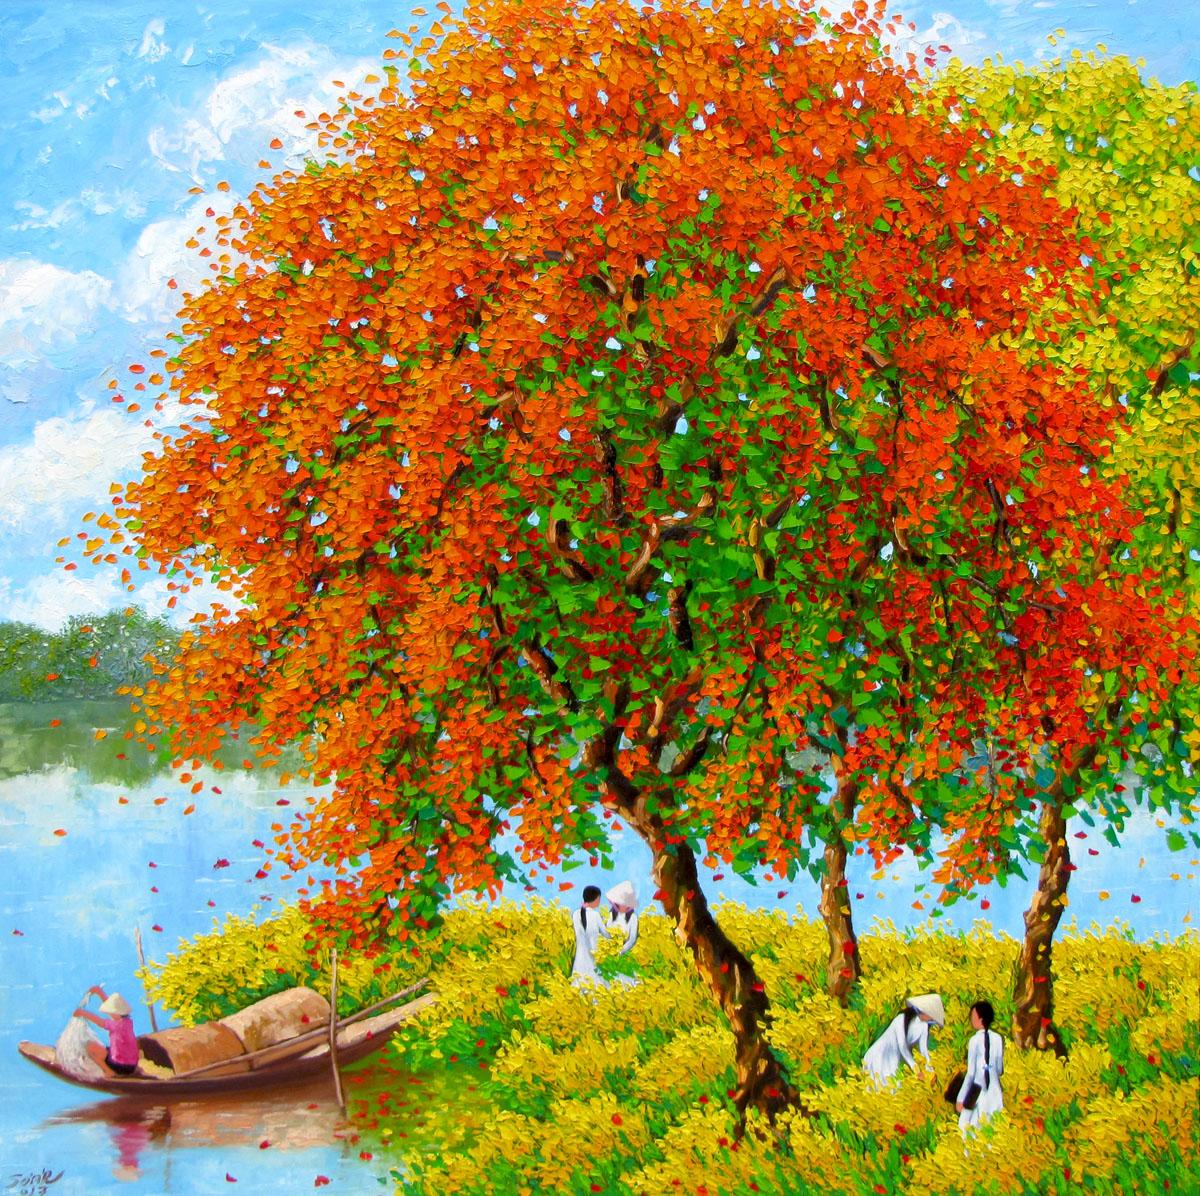 Blossom season by the river